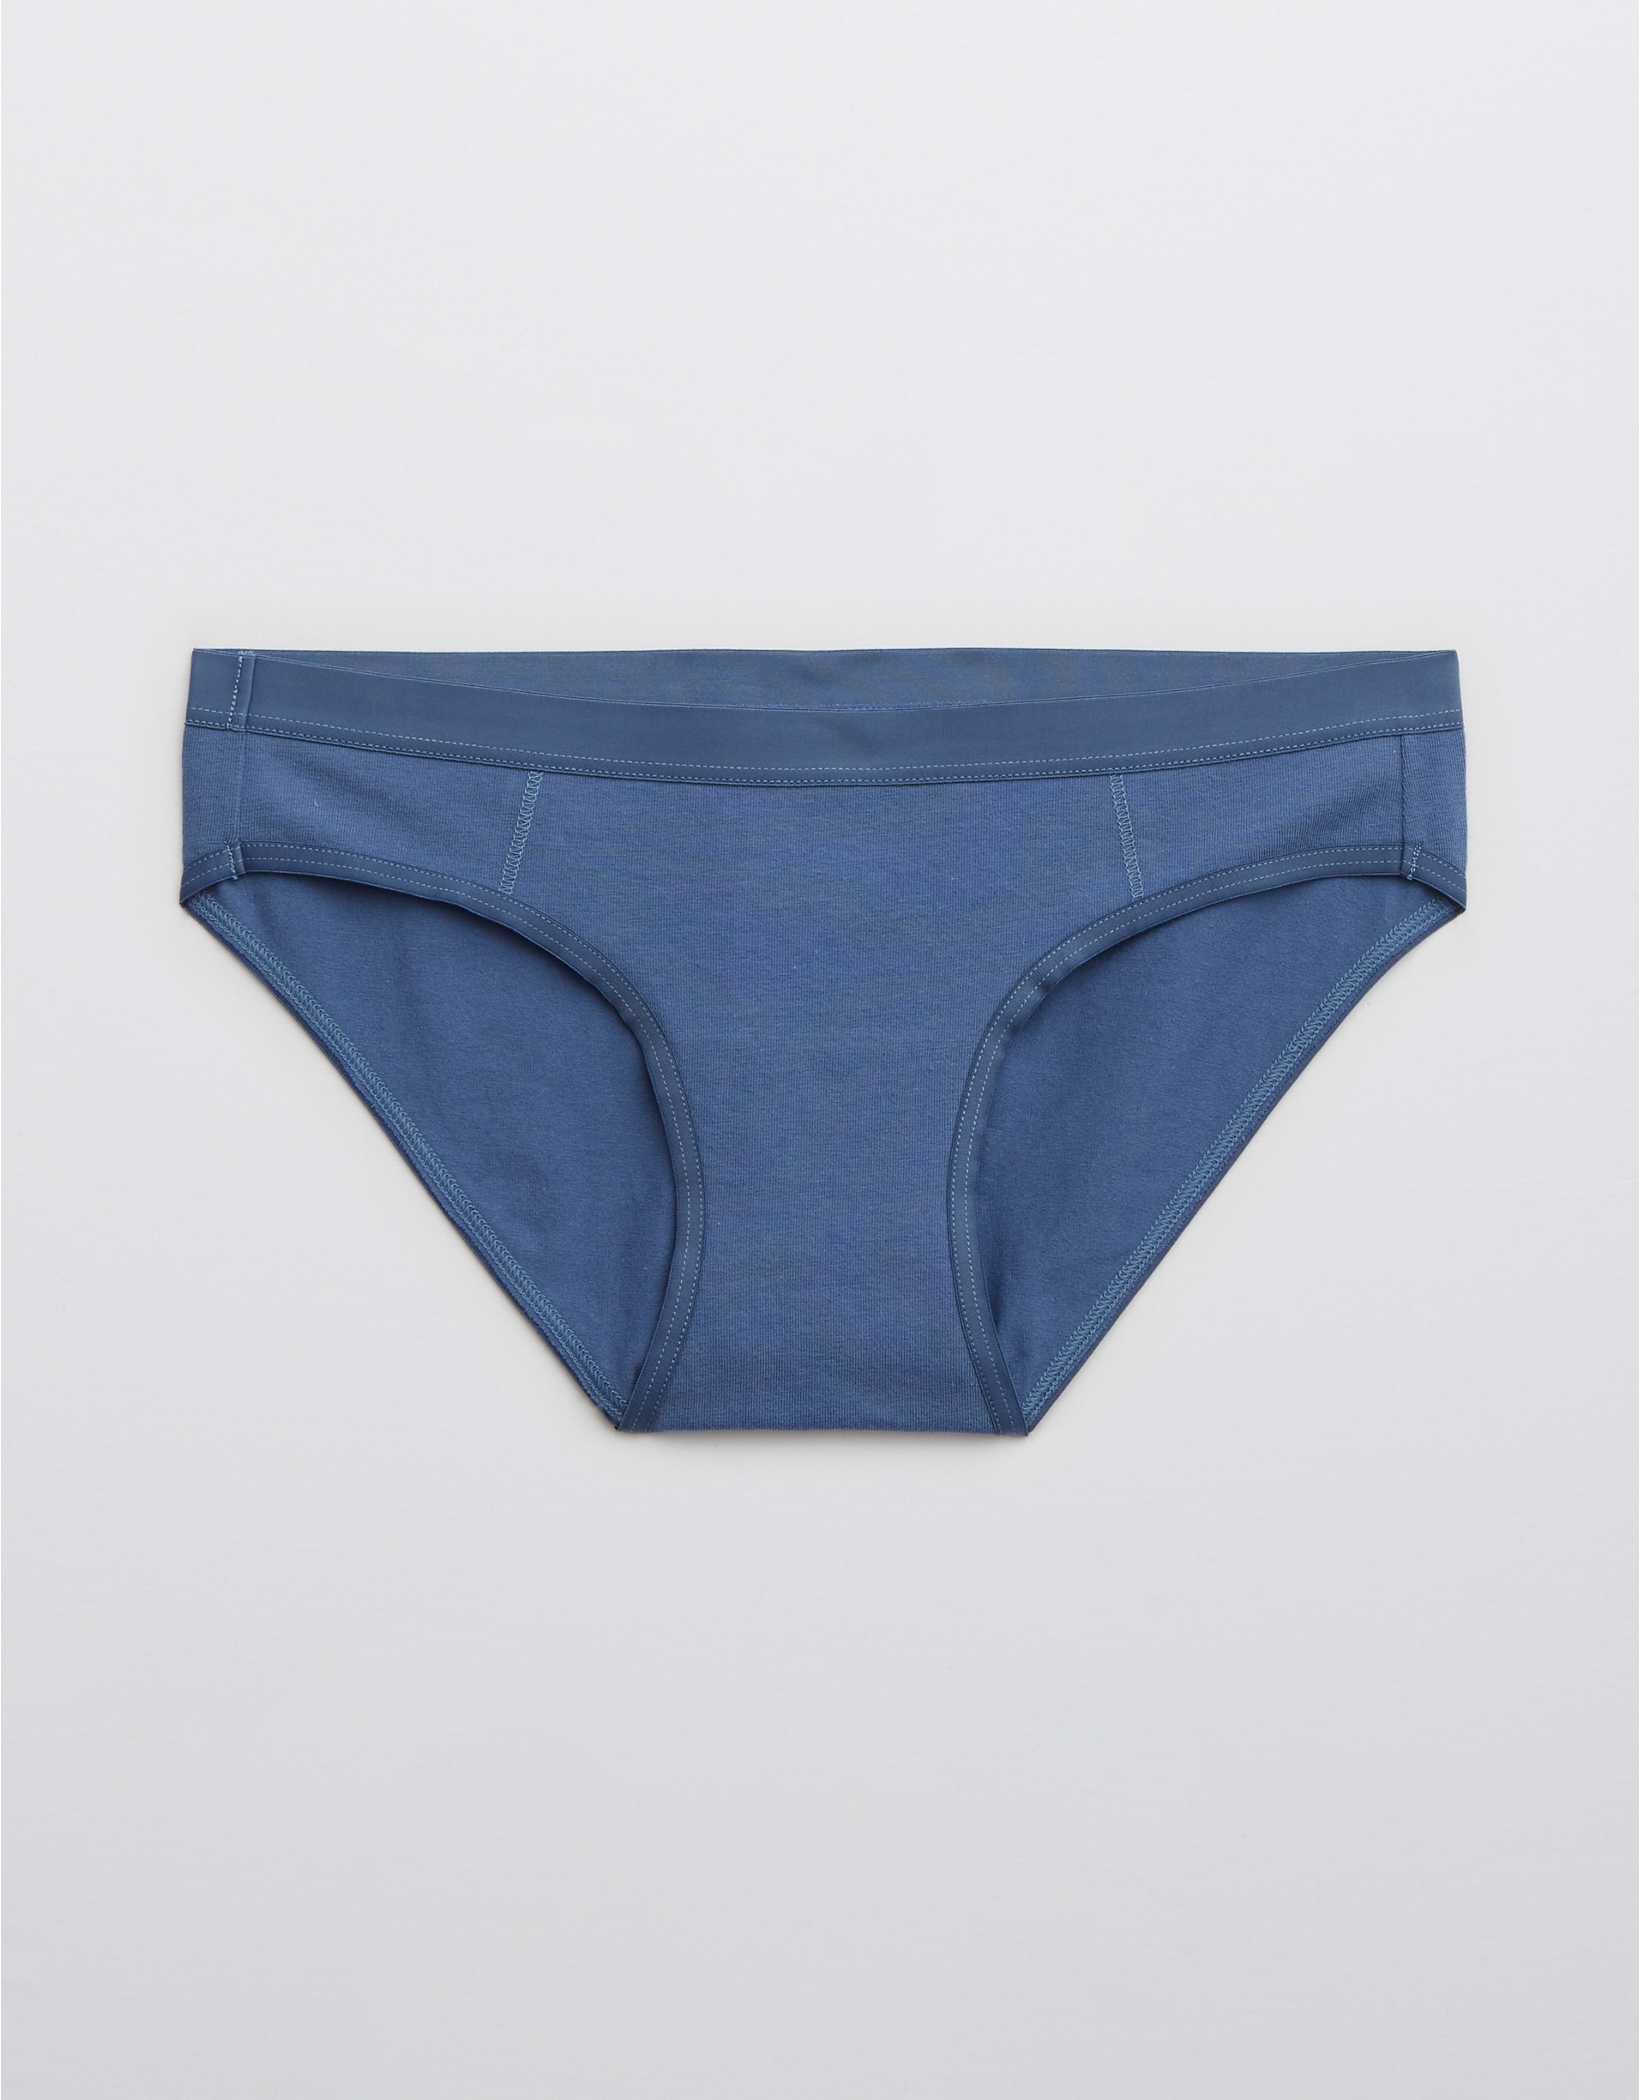 Aerie Cotton Elastic Bikini Underwear